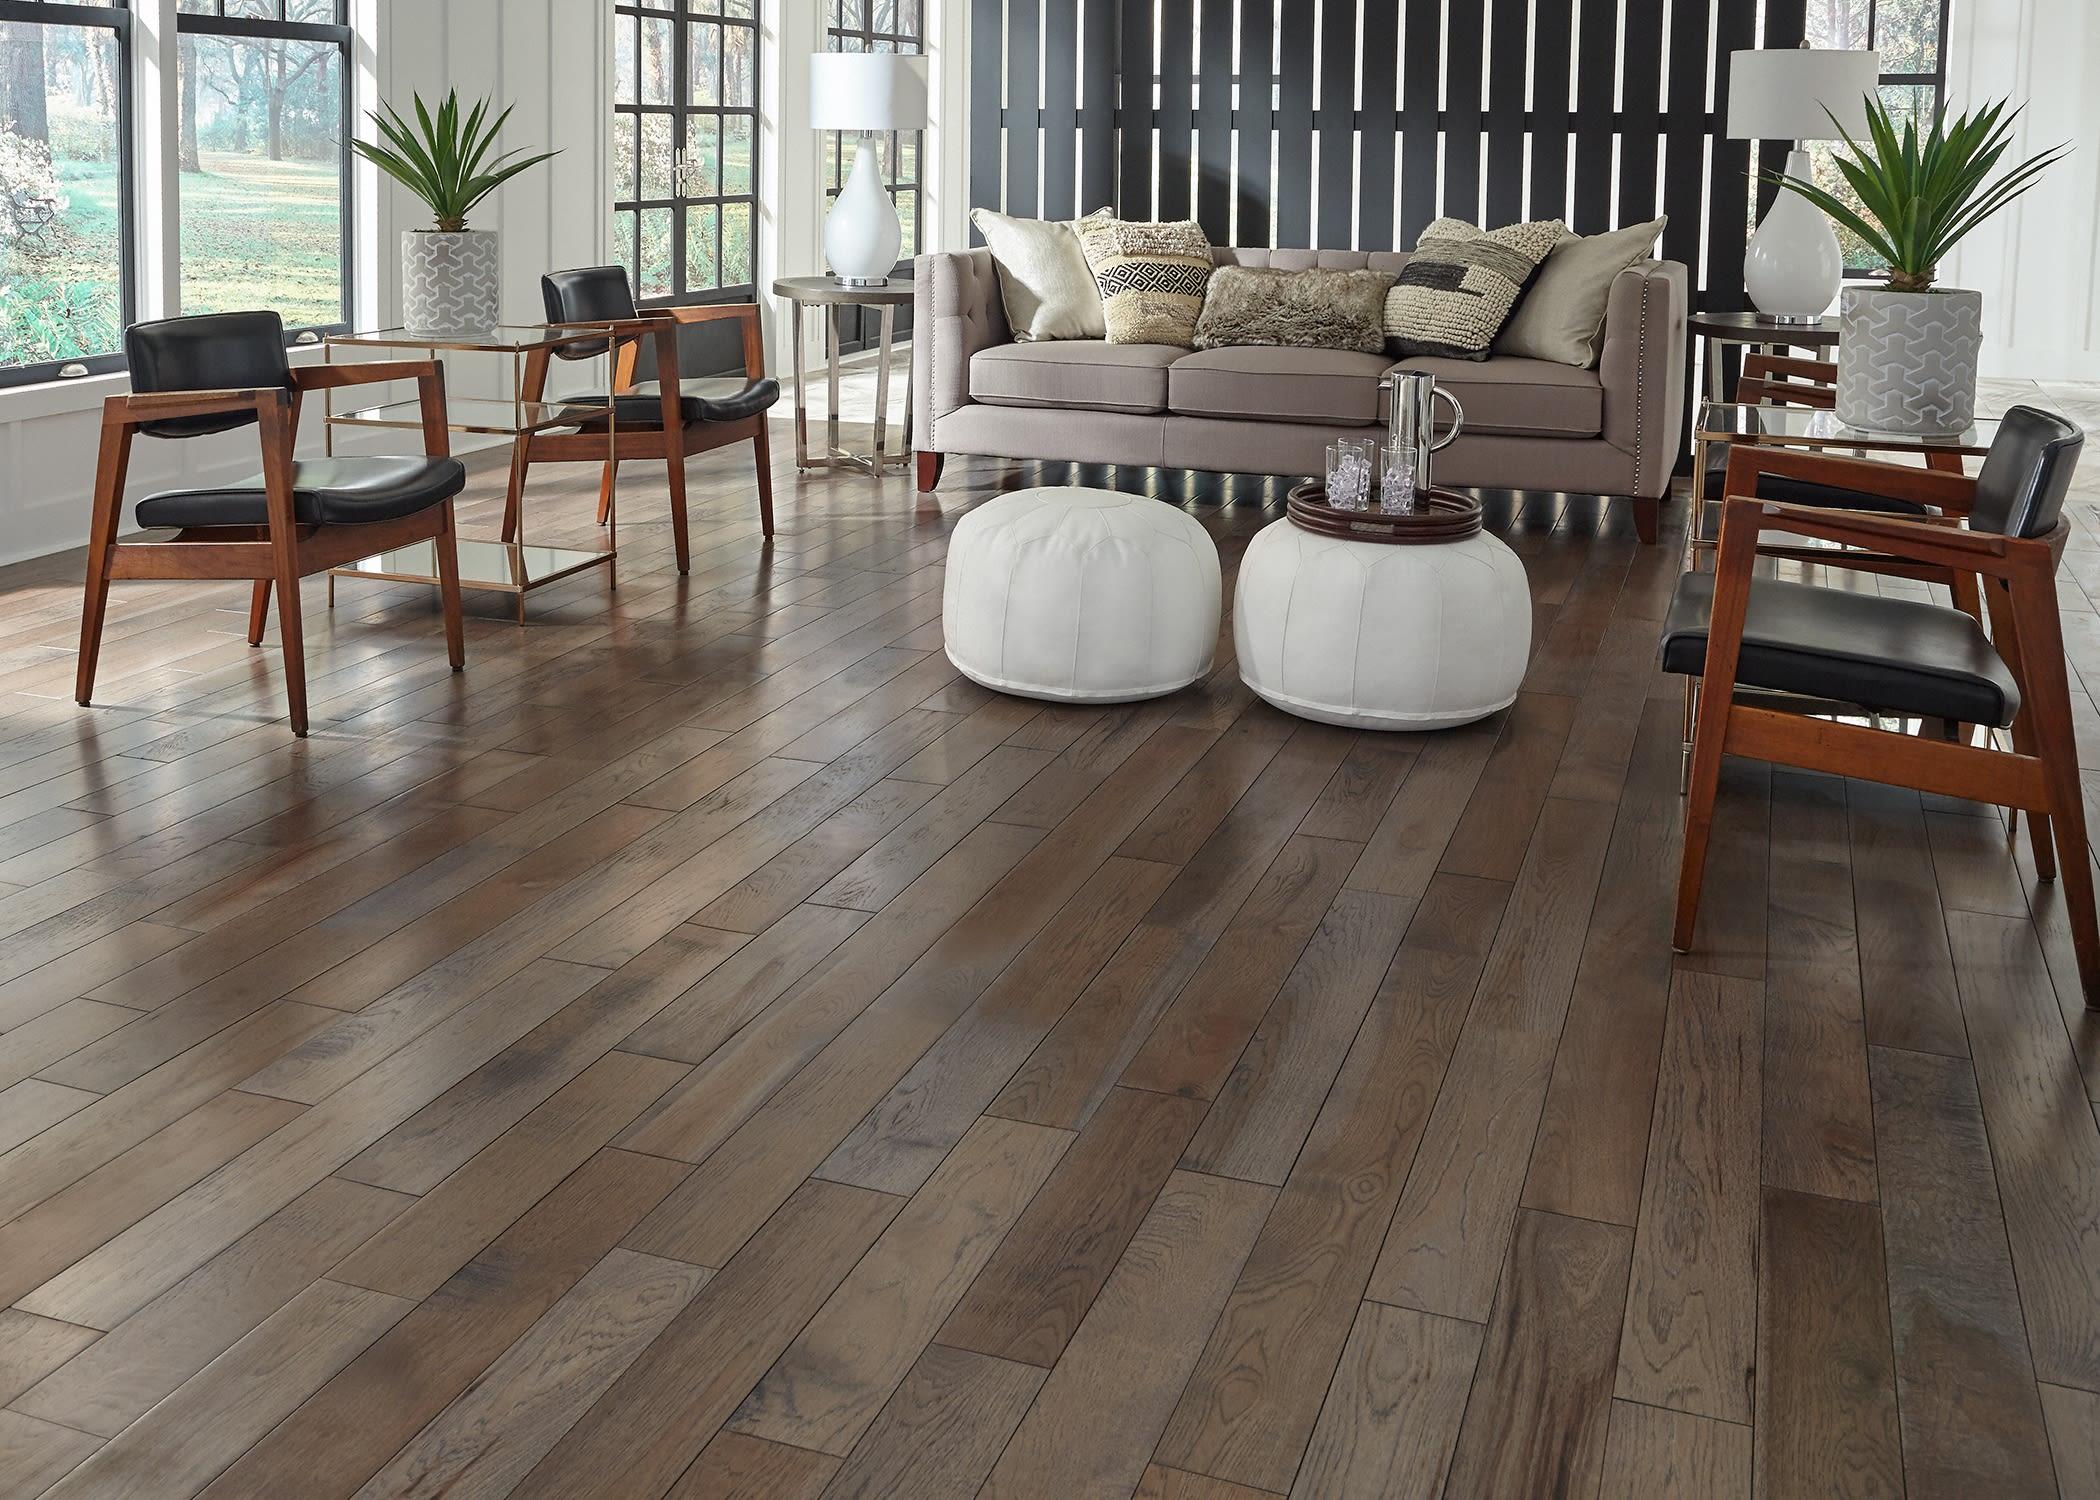 Bellawood Haversham Hickory Solid Hardwood